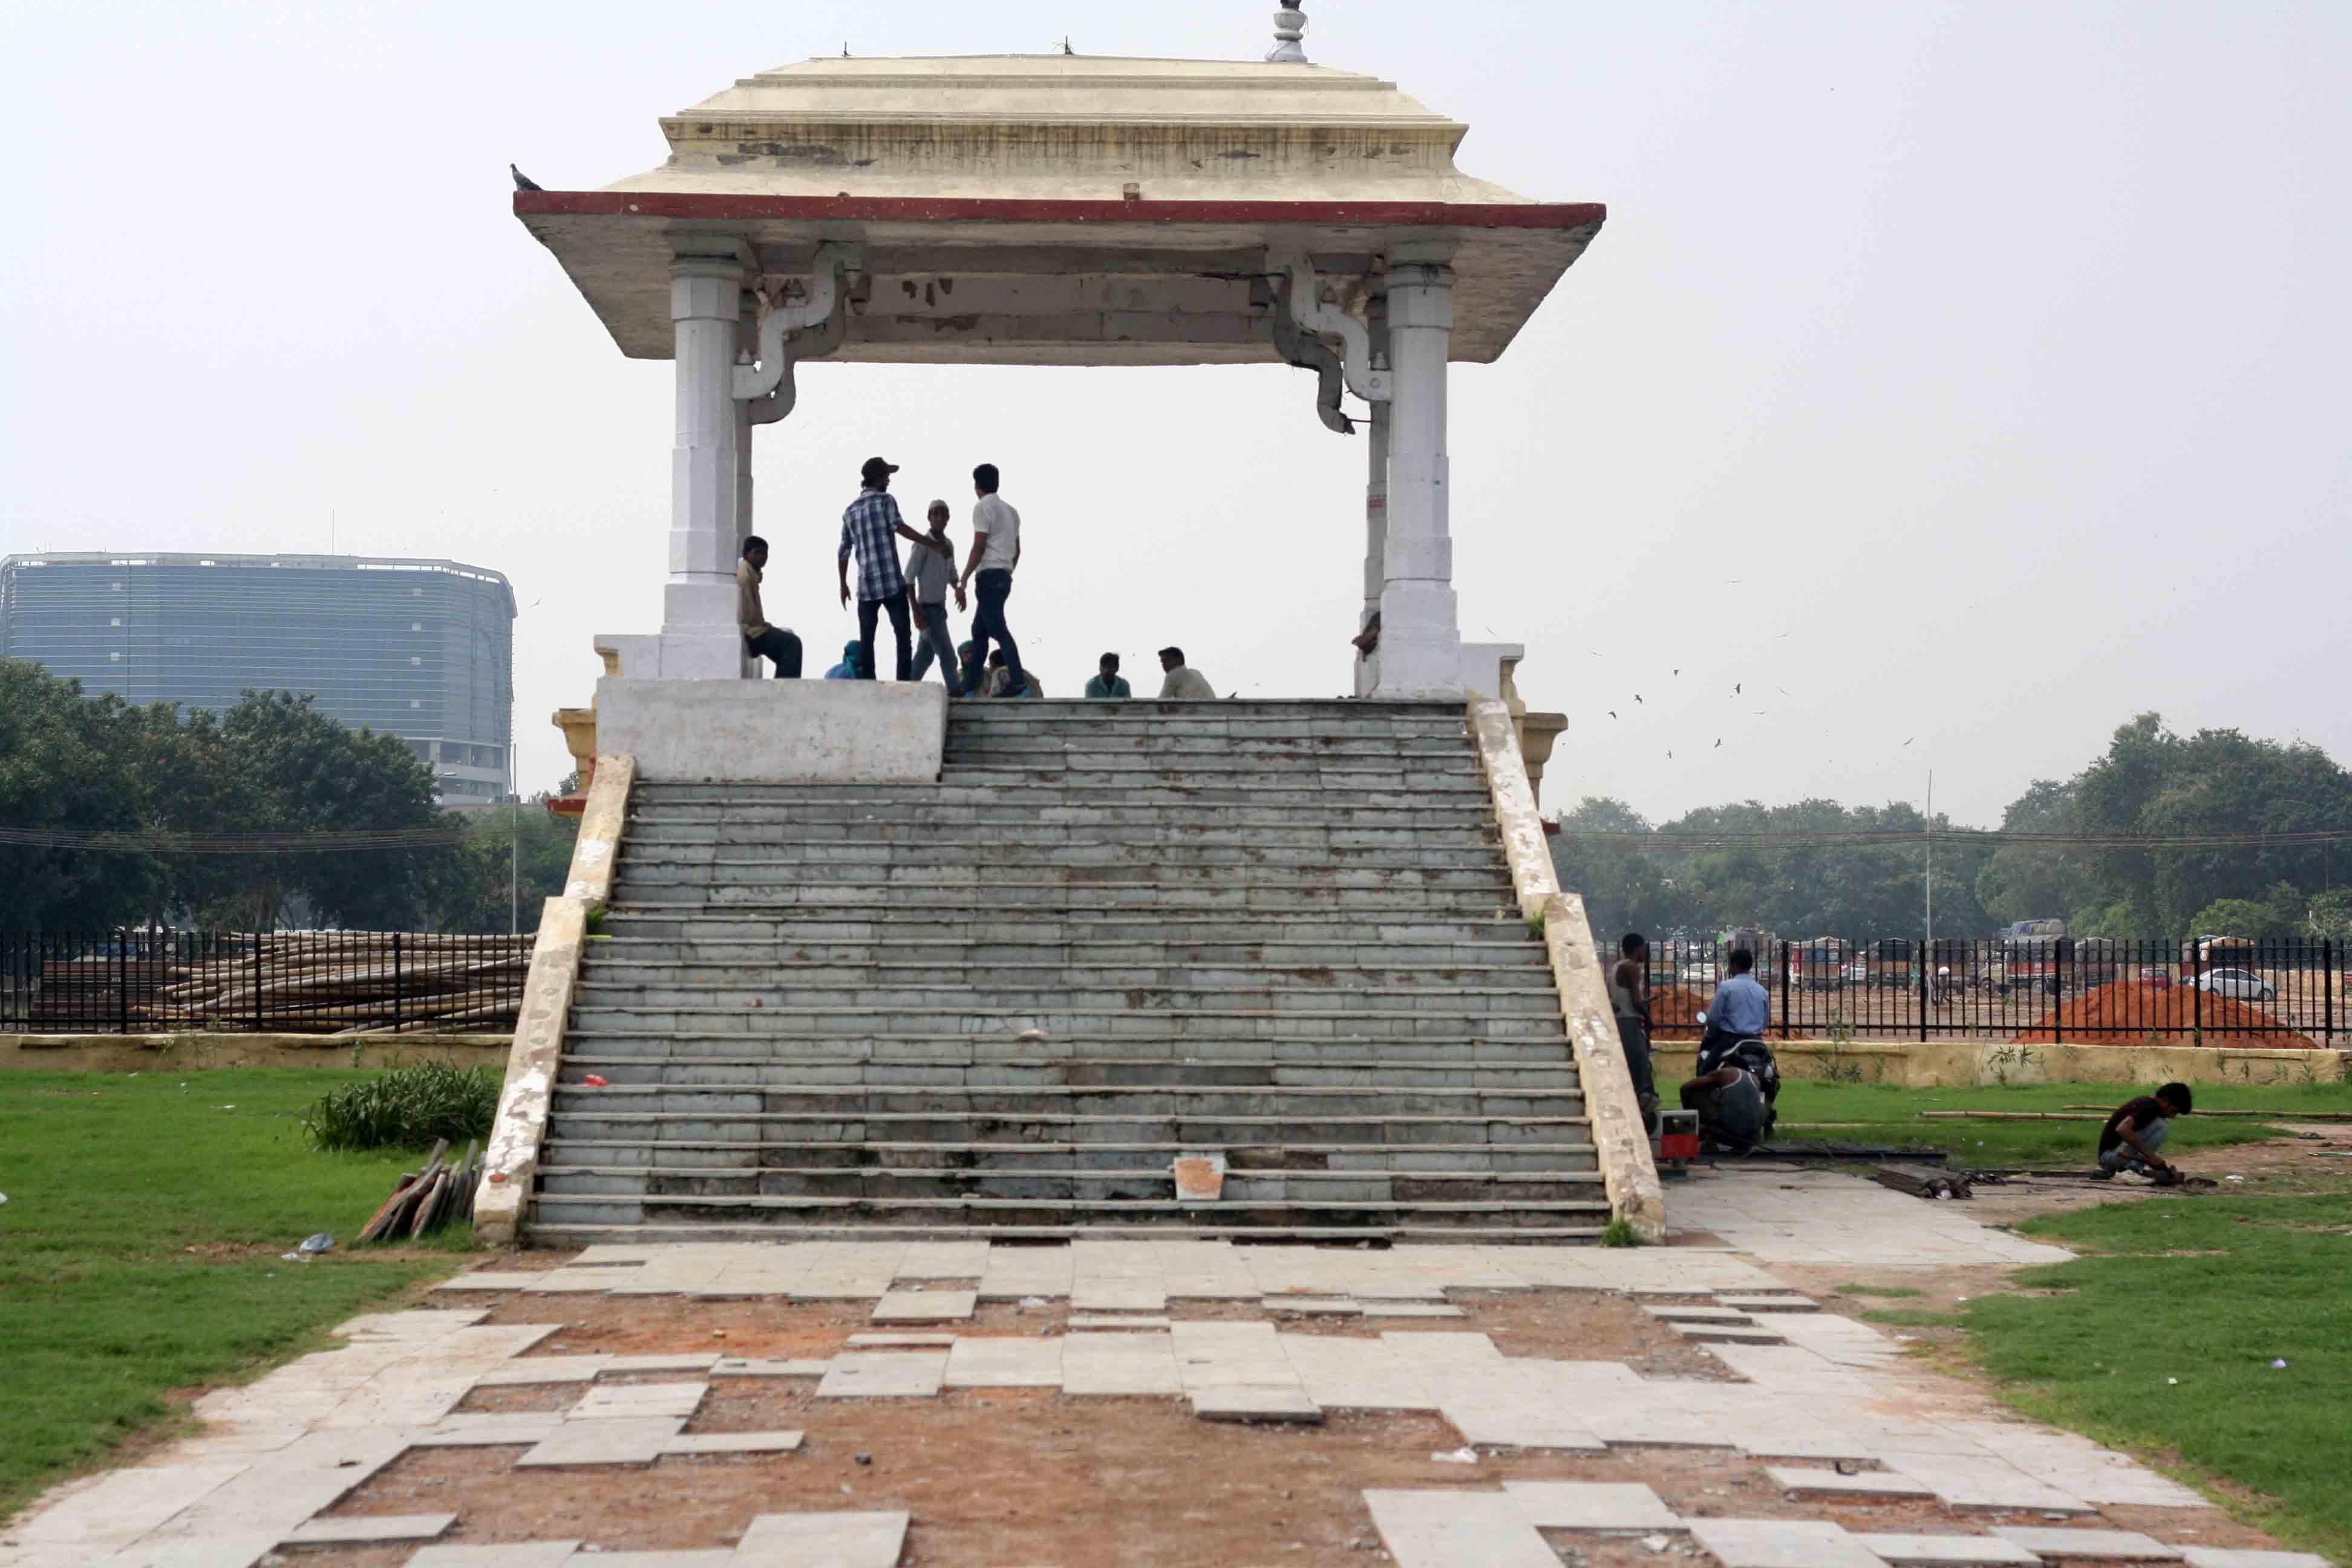 City Landmark - Ramlila Maidan, Central Delhi